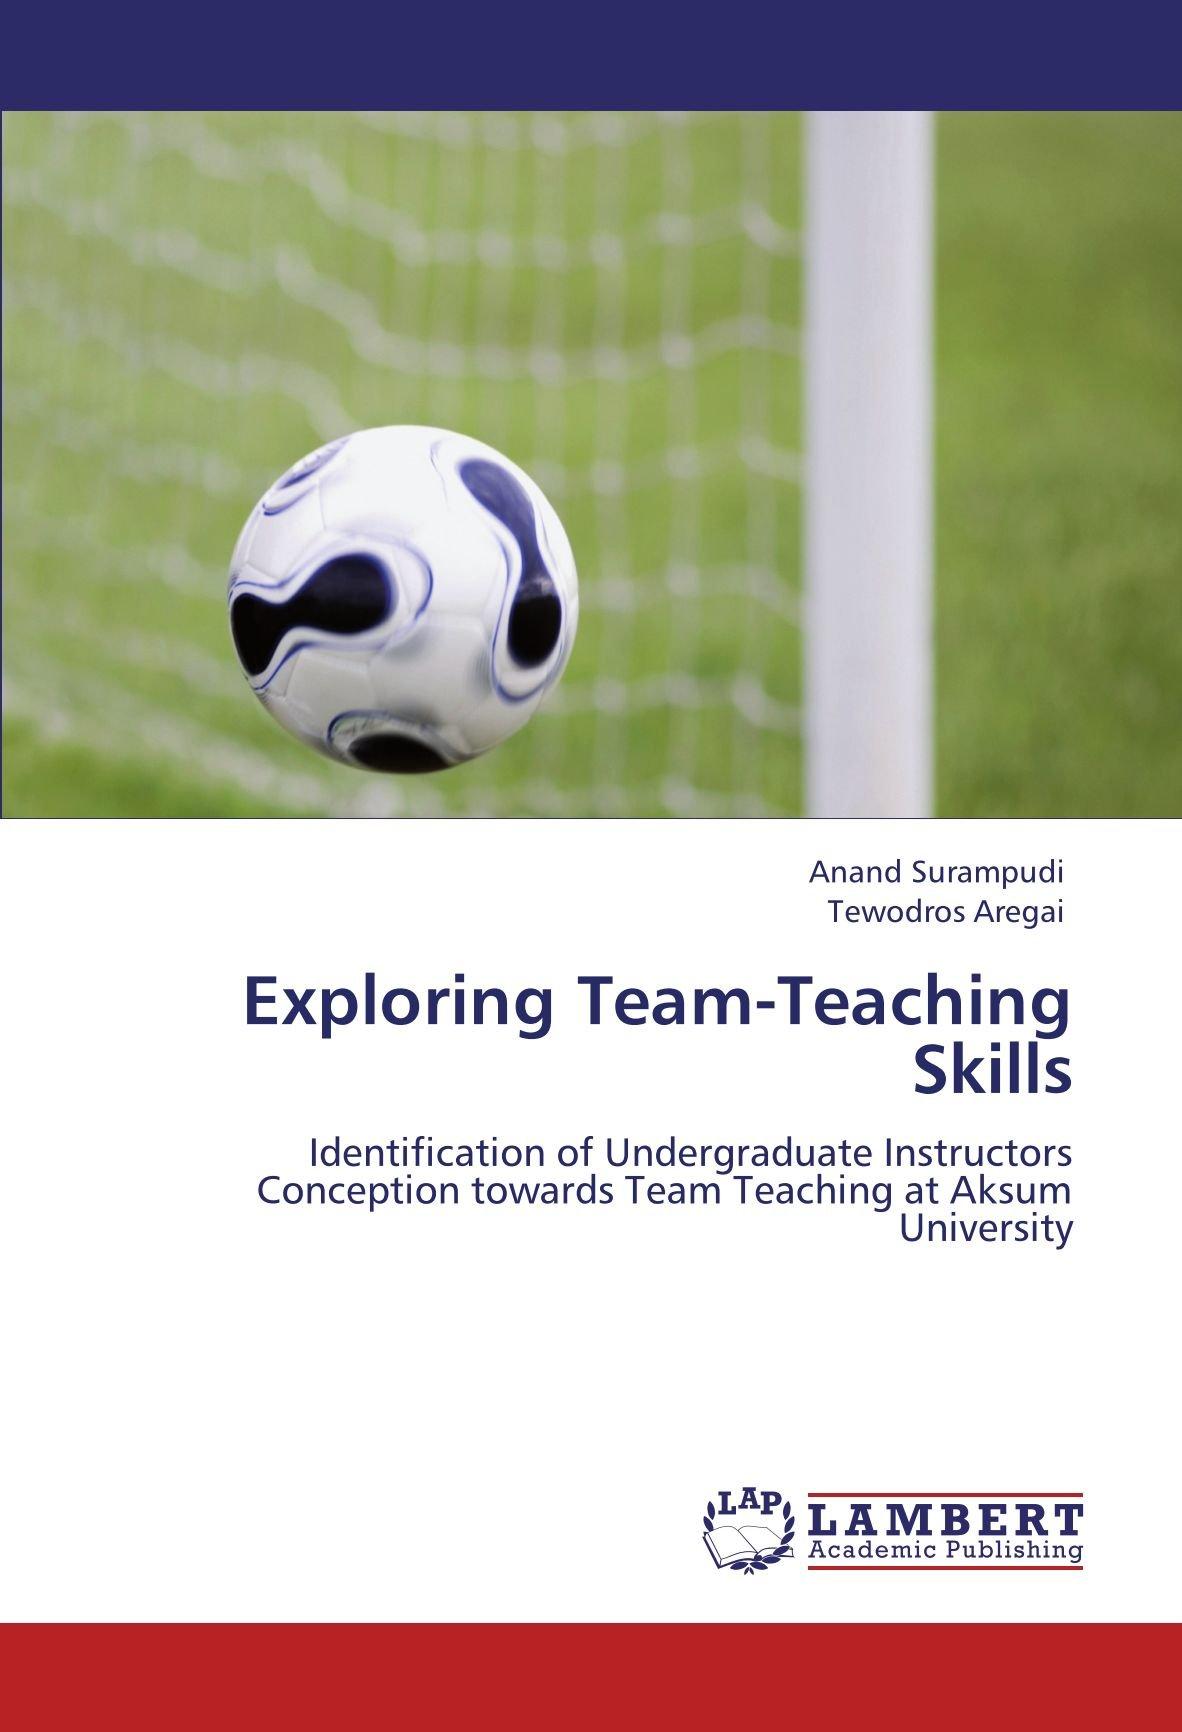 Exploring Team-Teaching Skills: Identification of